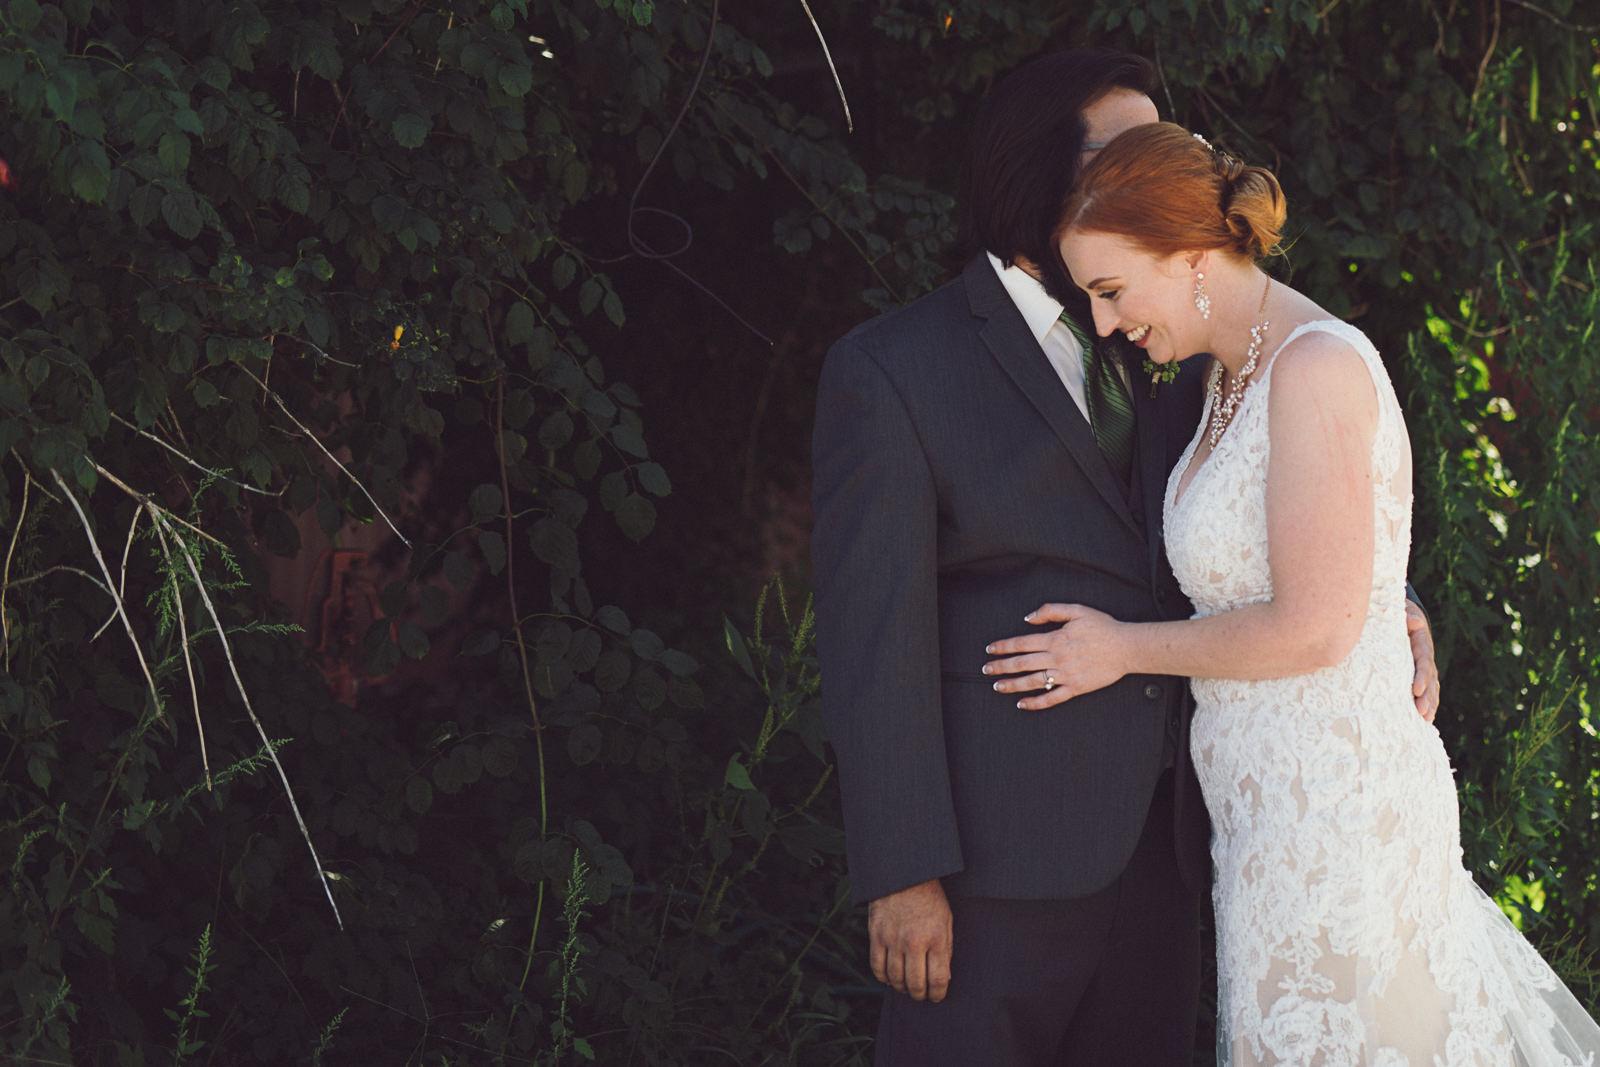 wedding-keely-caleb-435-name-your-photo.jpg